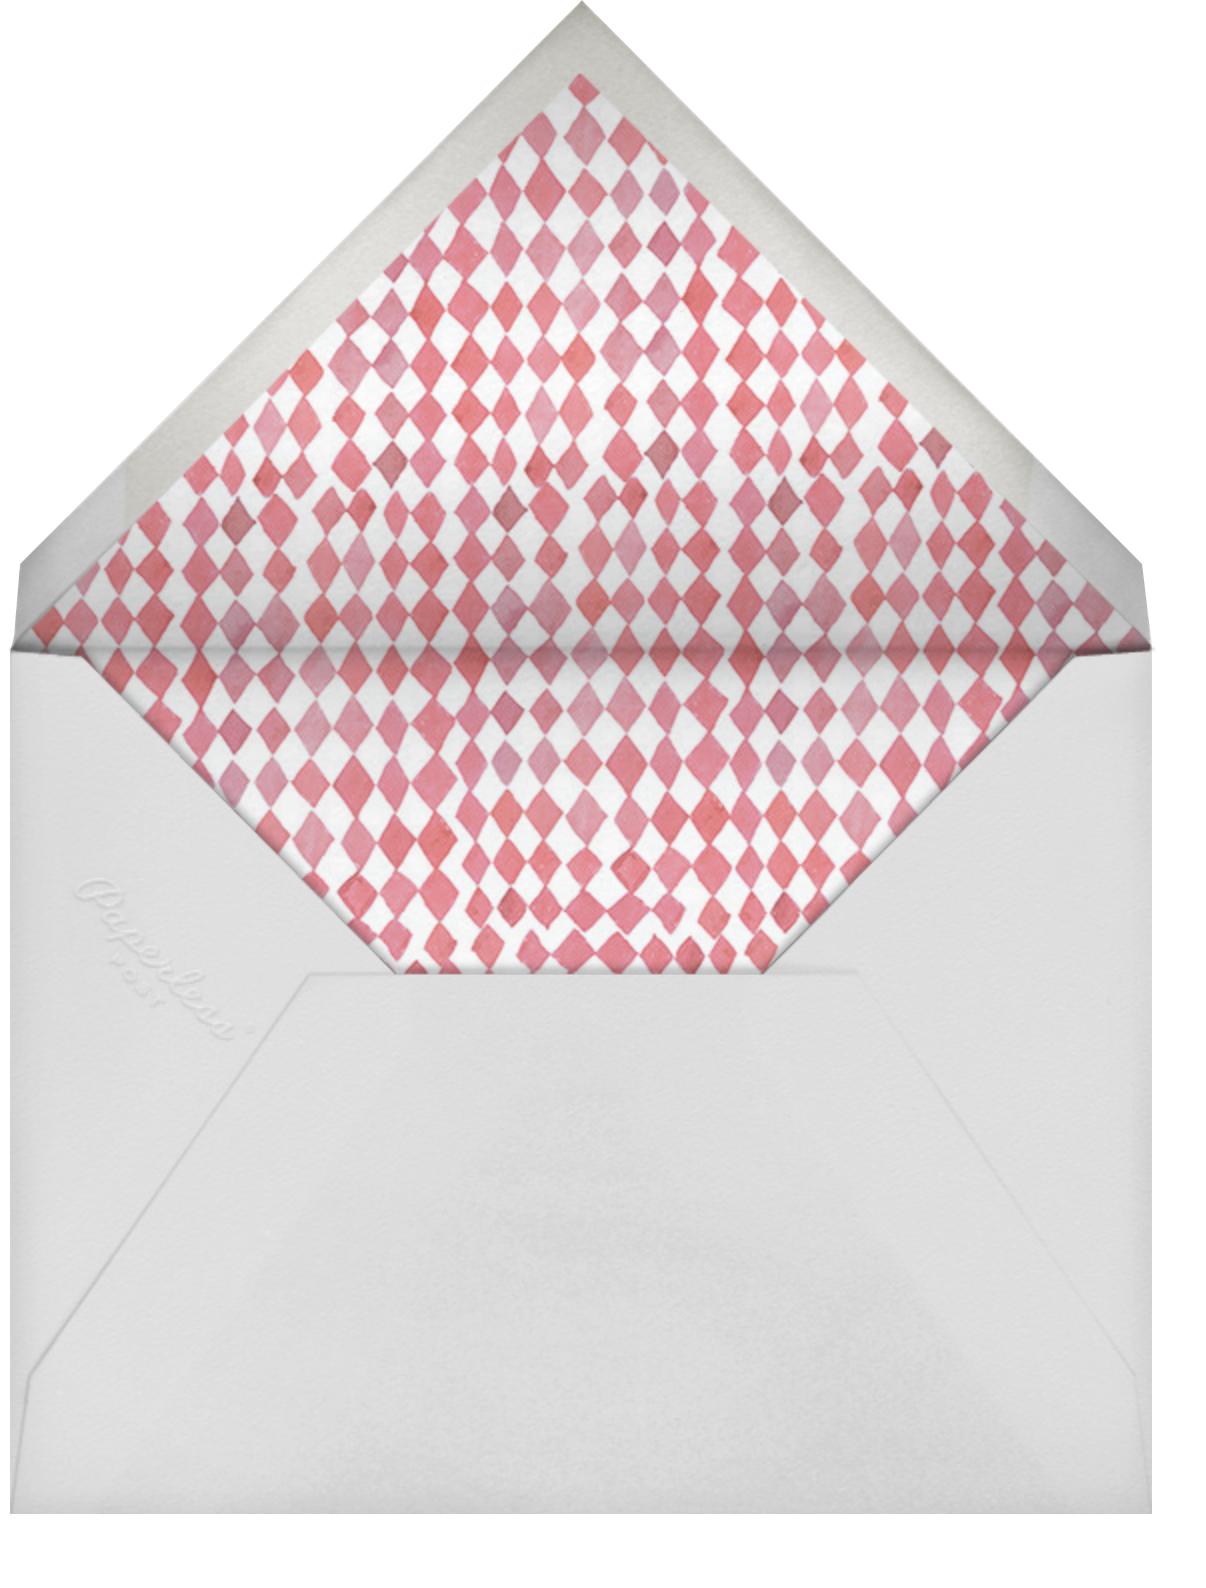 Buckets of Bubbles - Happy Menocal - Adult birthday - envelope back